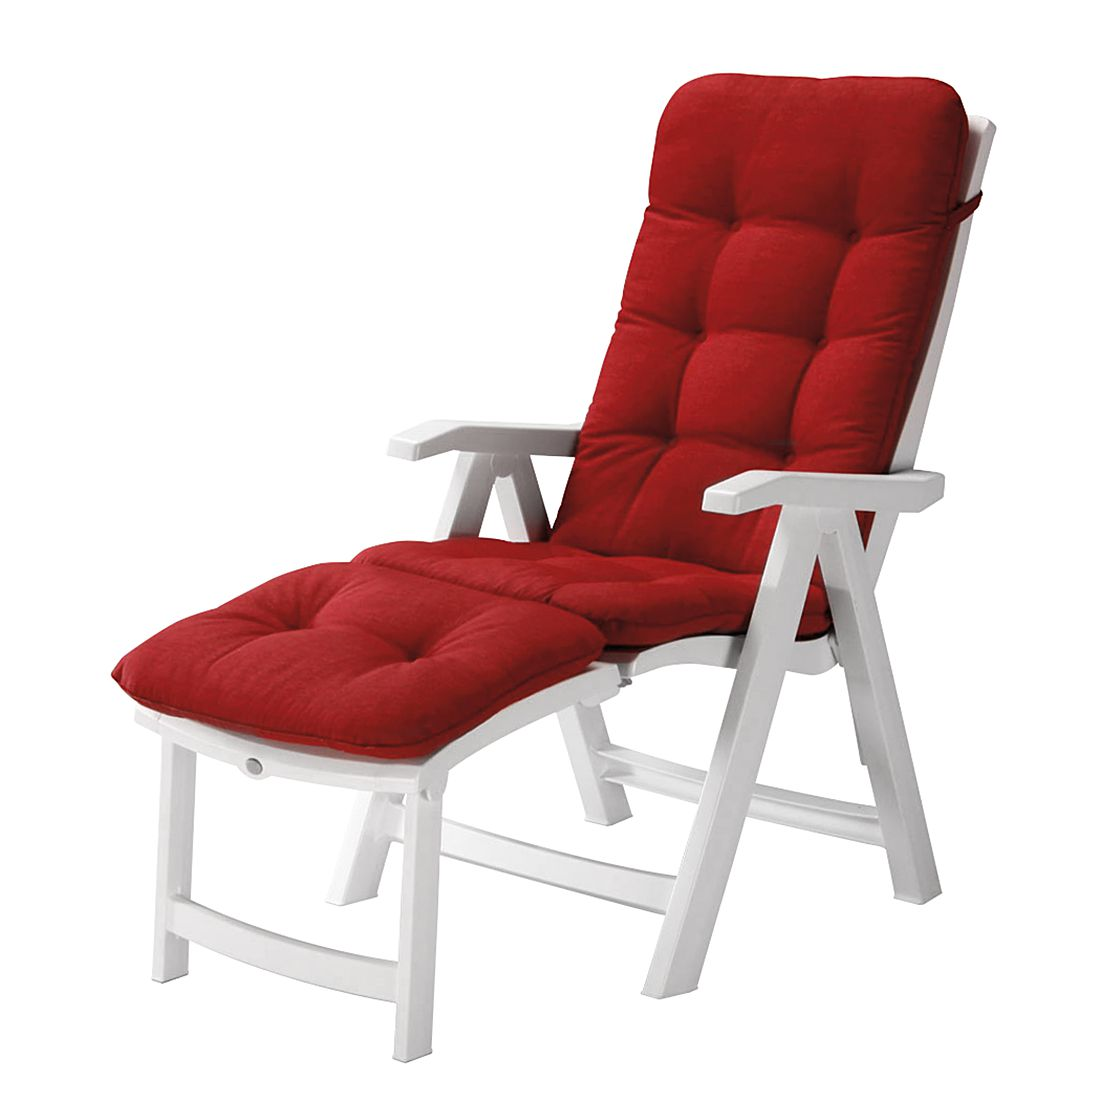 sonnenliegen online g nstig kaufen ber shop24. Black Bedroom Furniture Sets. Home Design Ideas